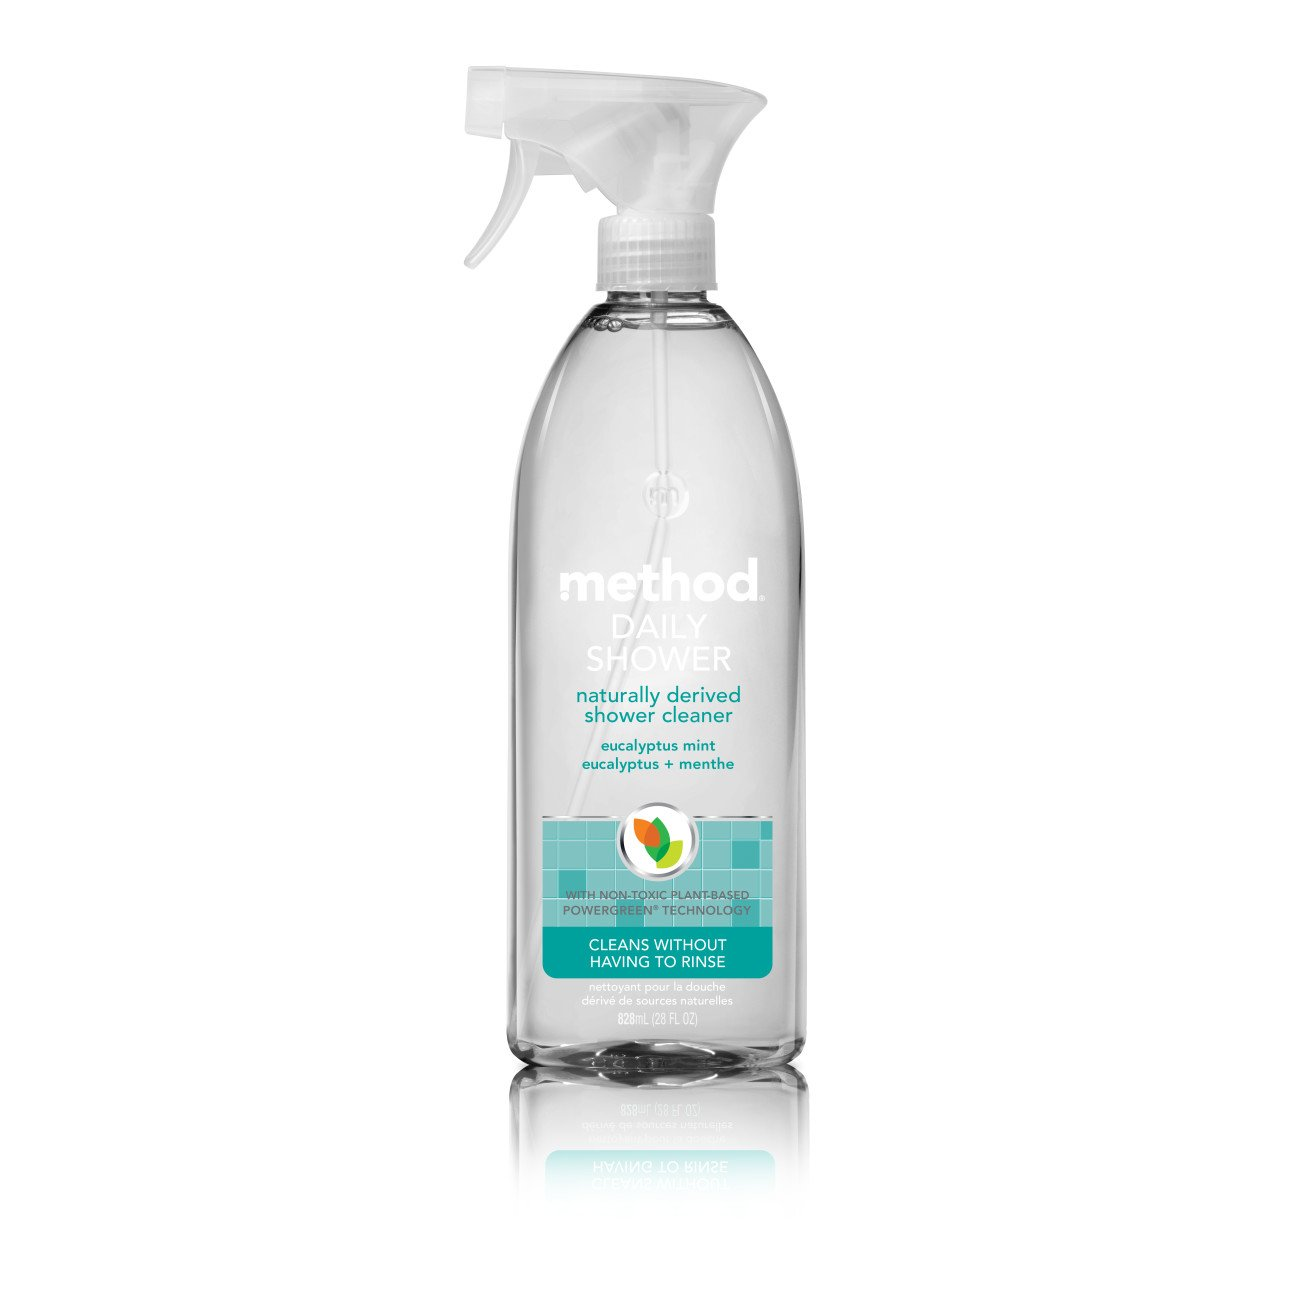 Method Daily Shower Spray Cleaner, Eucalyptus Mint, 28 Ounce (Pack 8)